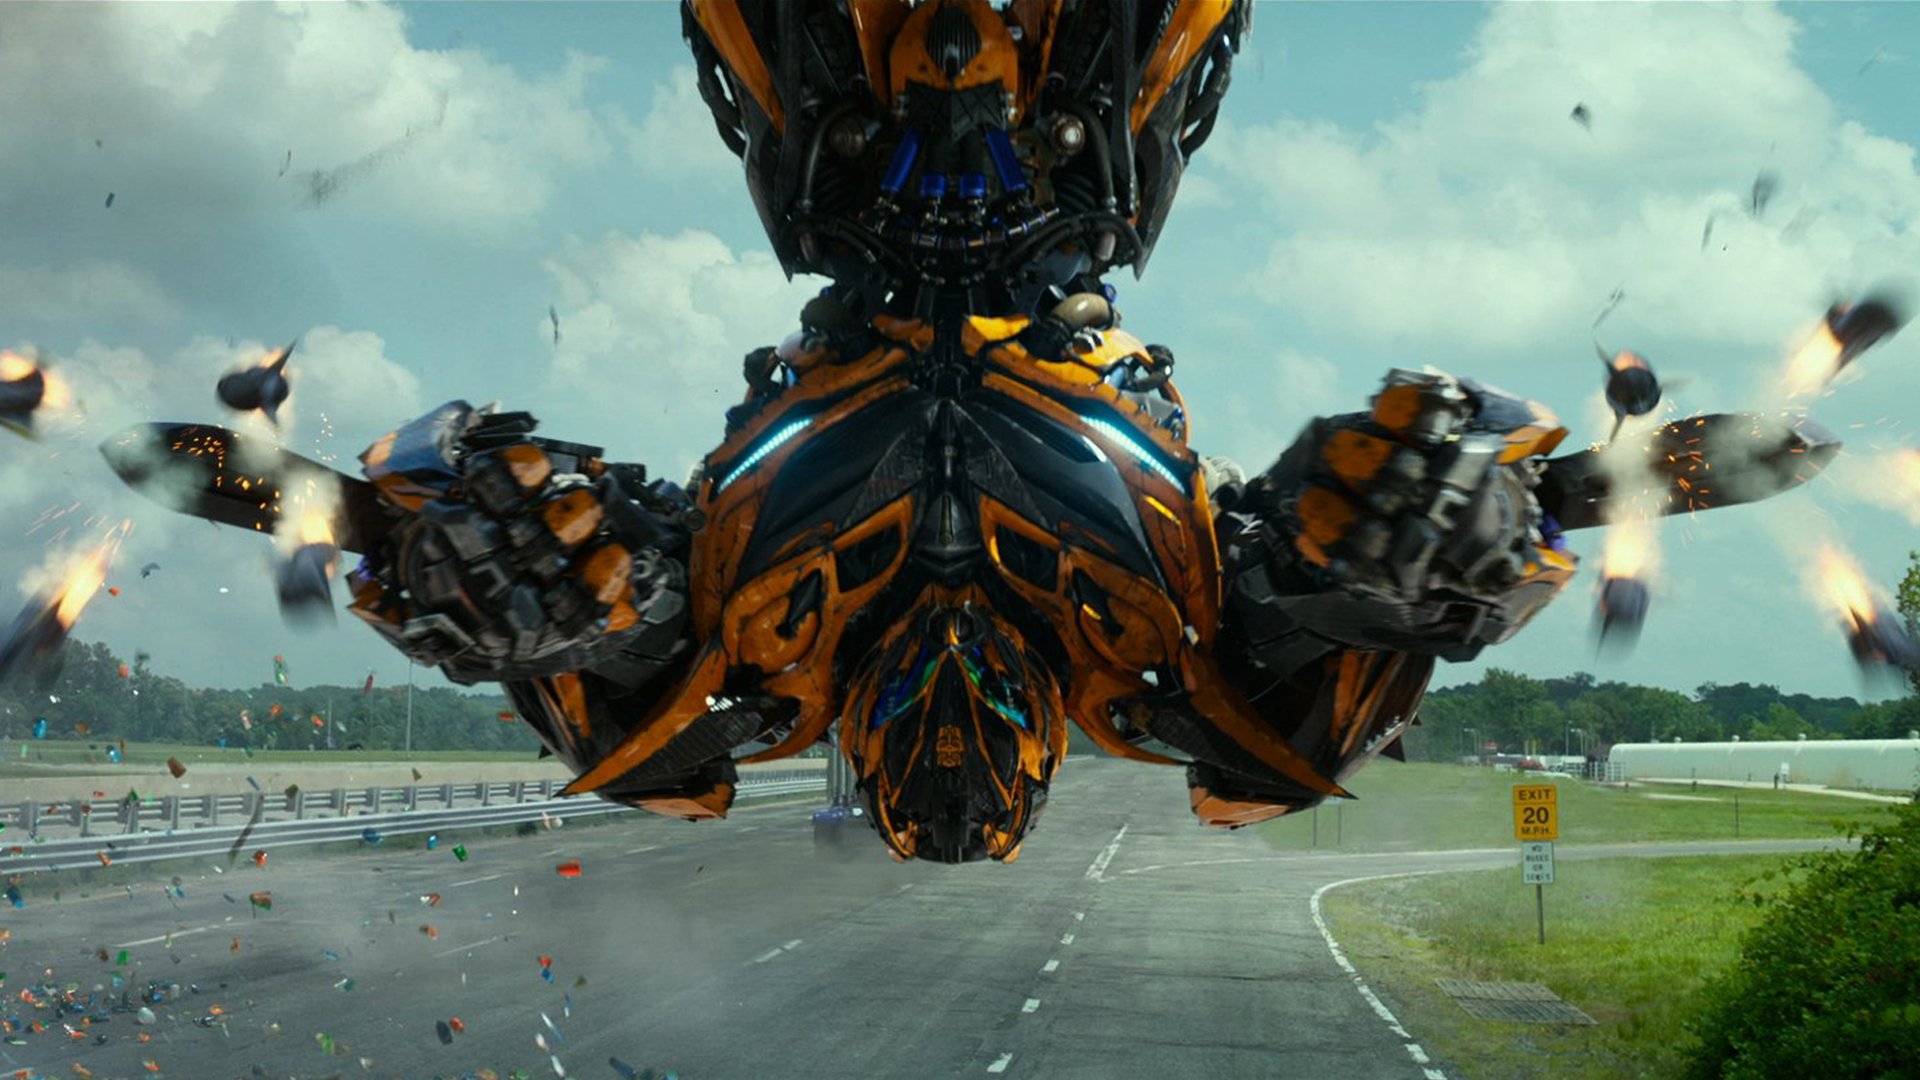 Bumblebee Transformers 1920x1080